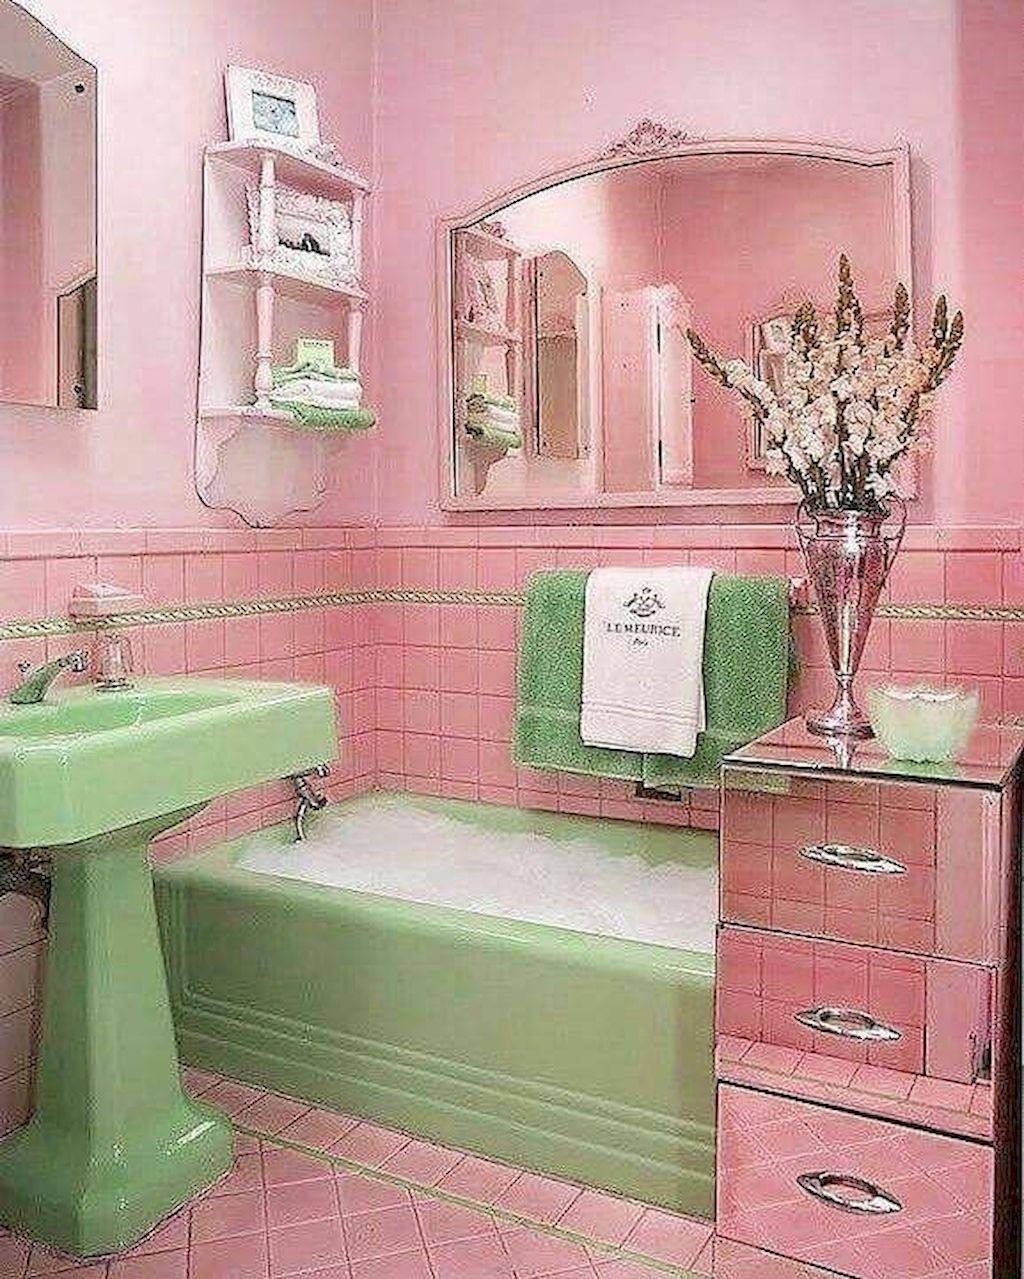 Fantasticretrohomedecororlakiely Chic Home Decor Shabby Chic Room Retro Home Decor